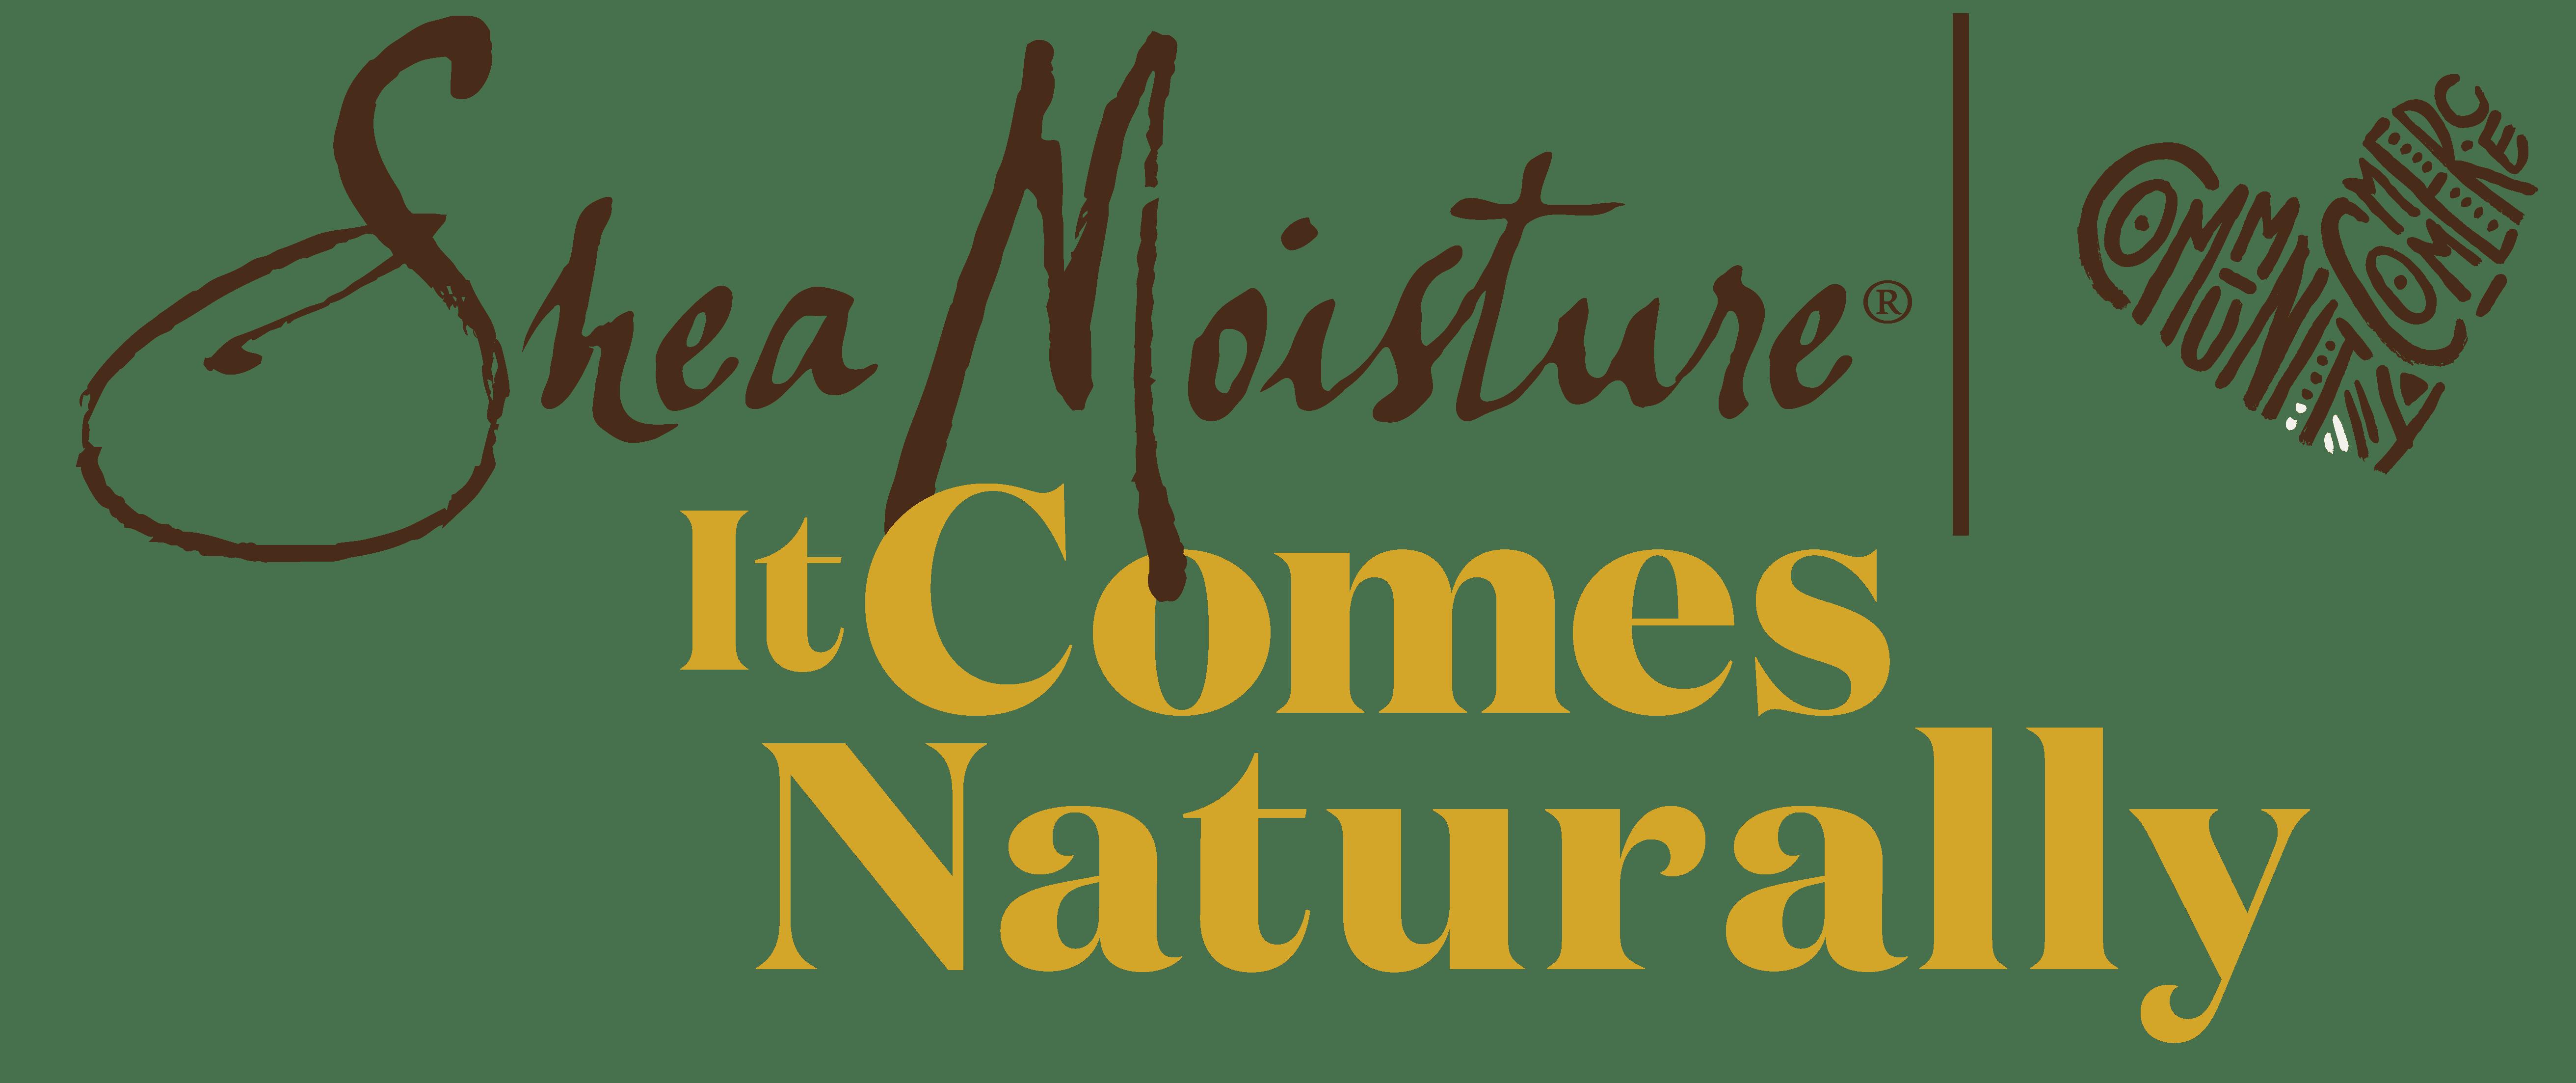 SheaMoisture Logo